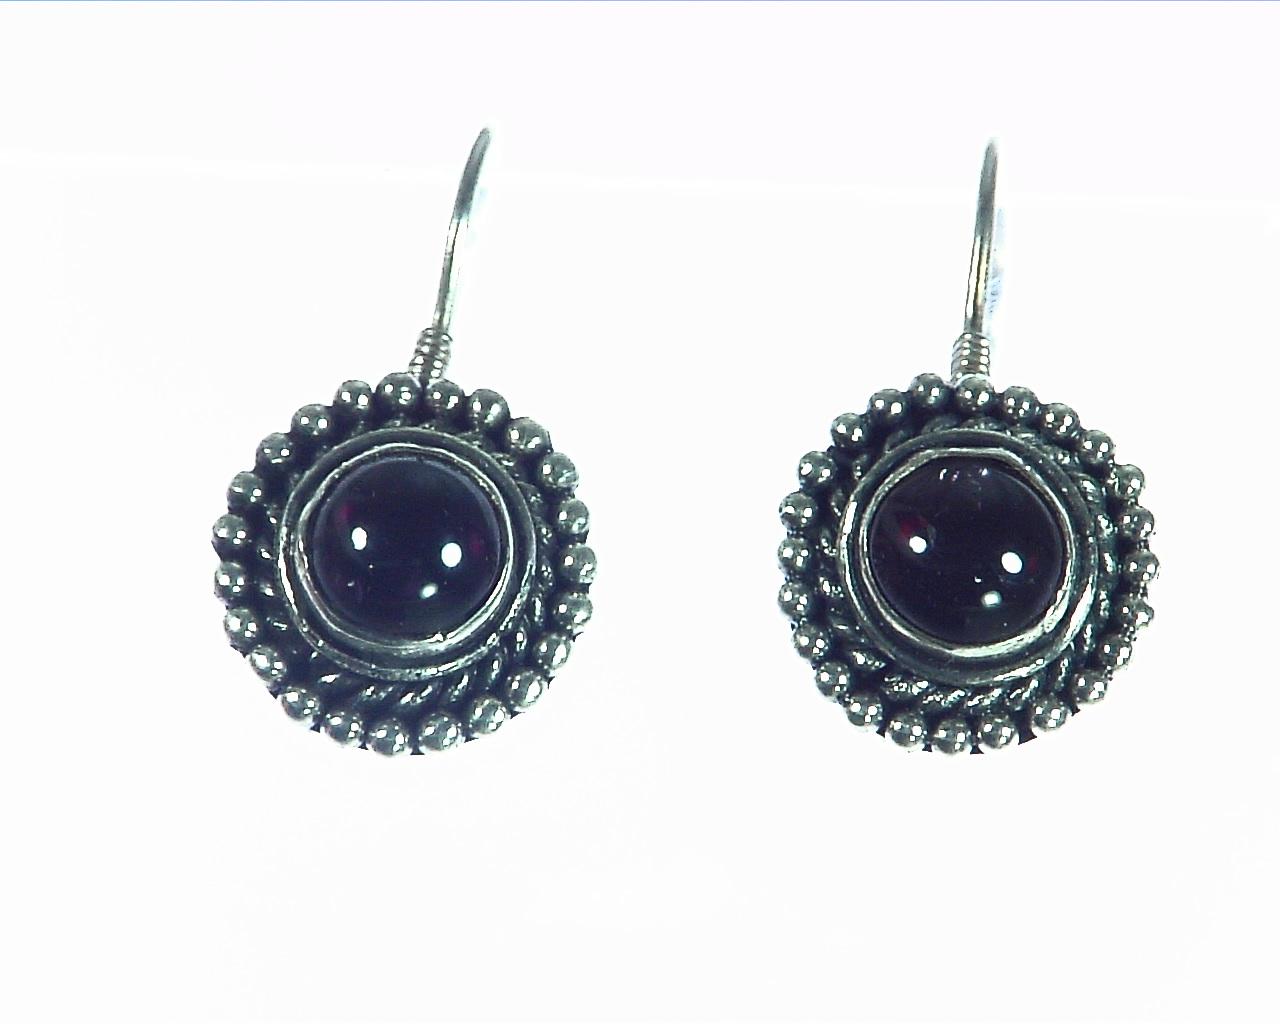 Garnet Cabasson Set in Sterling Silver Earring, 795 3